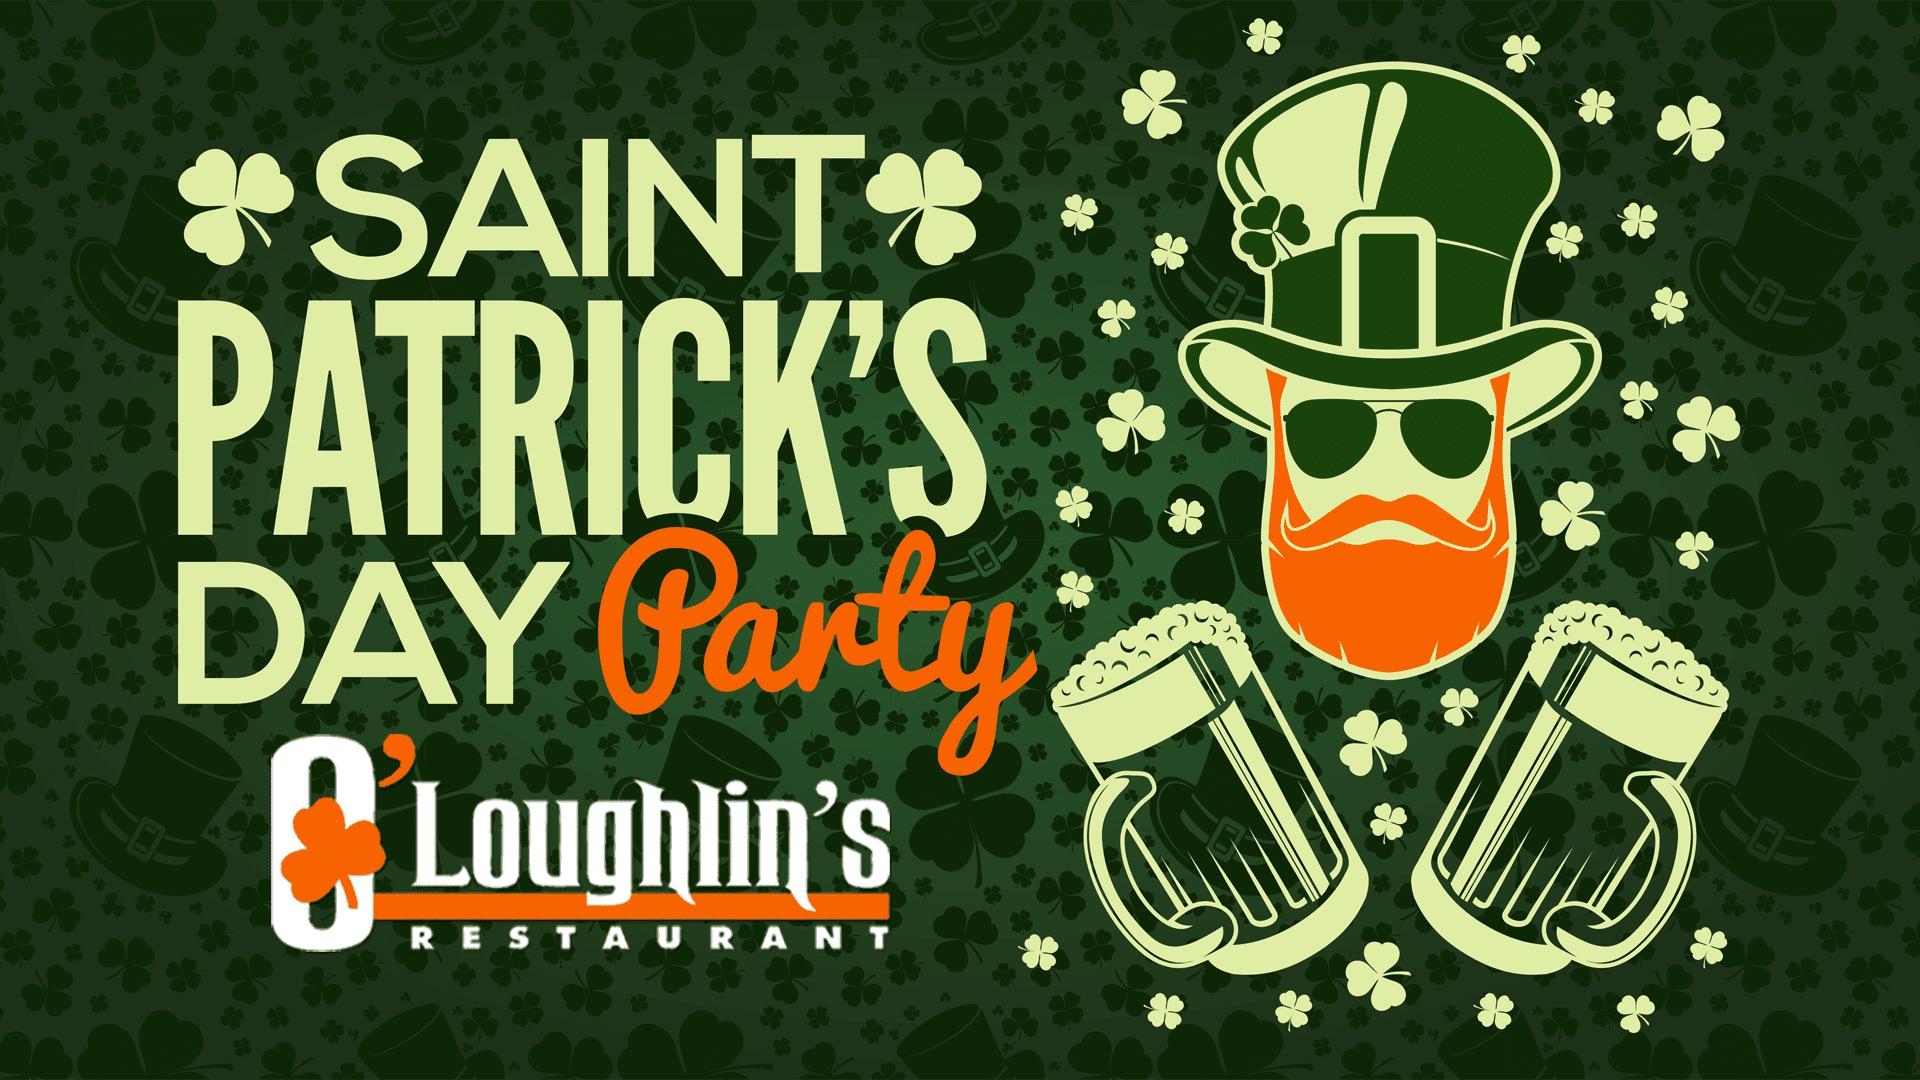 Oloughlins St. Patricks Day Event